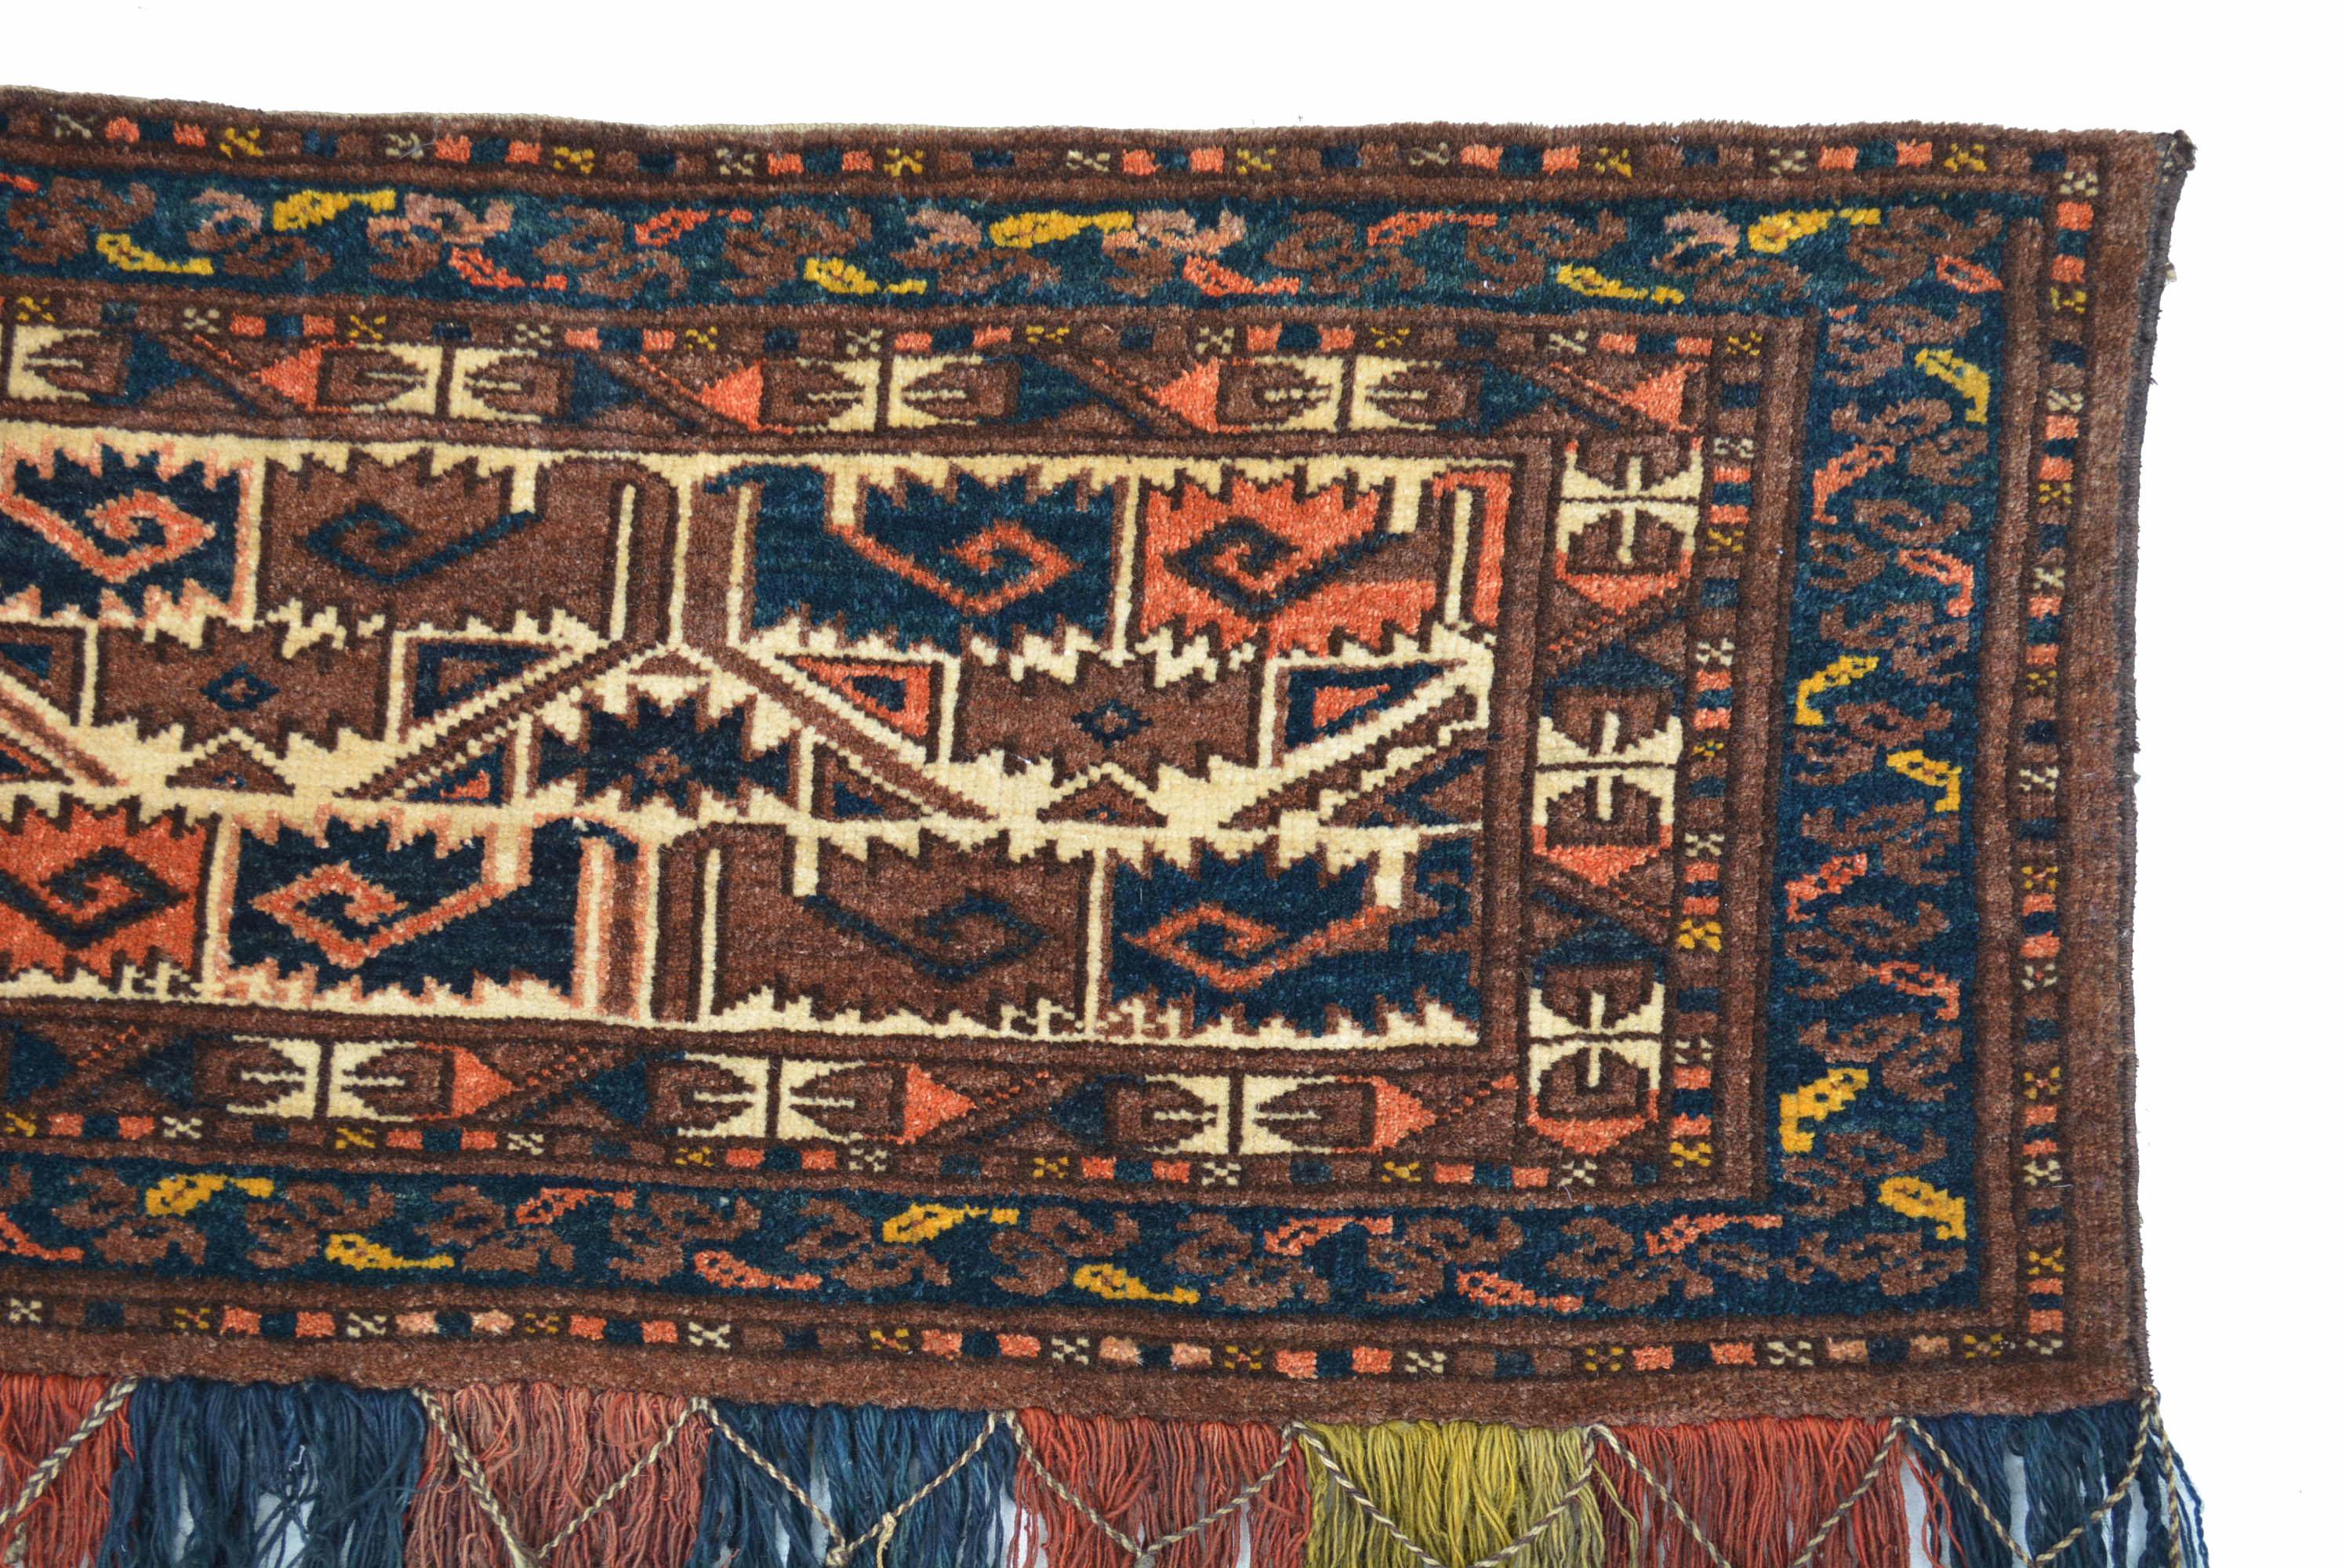 antik turkmenistan teppich jomud zelttasche zelt schmuck torba tent bag handmade ebay. Black Bedroom Furniture Sets. Home Design Ideas